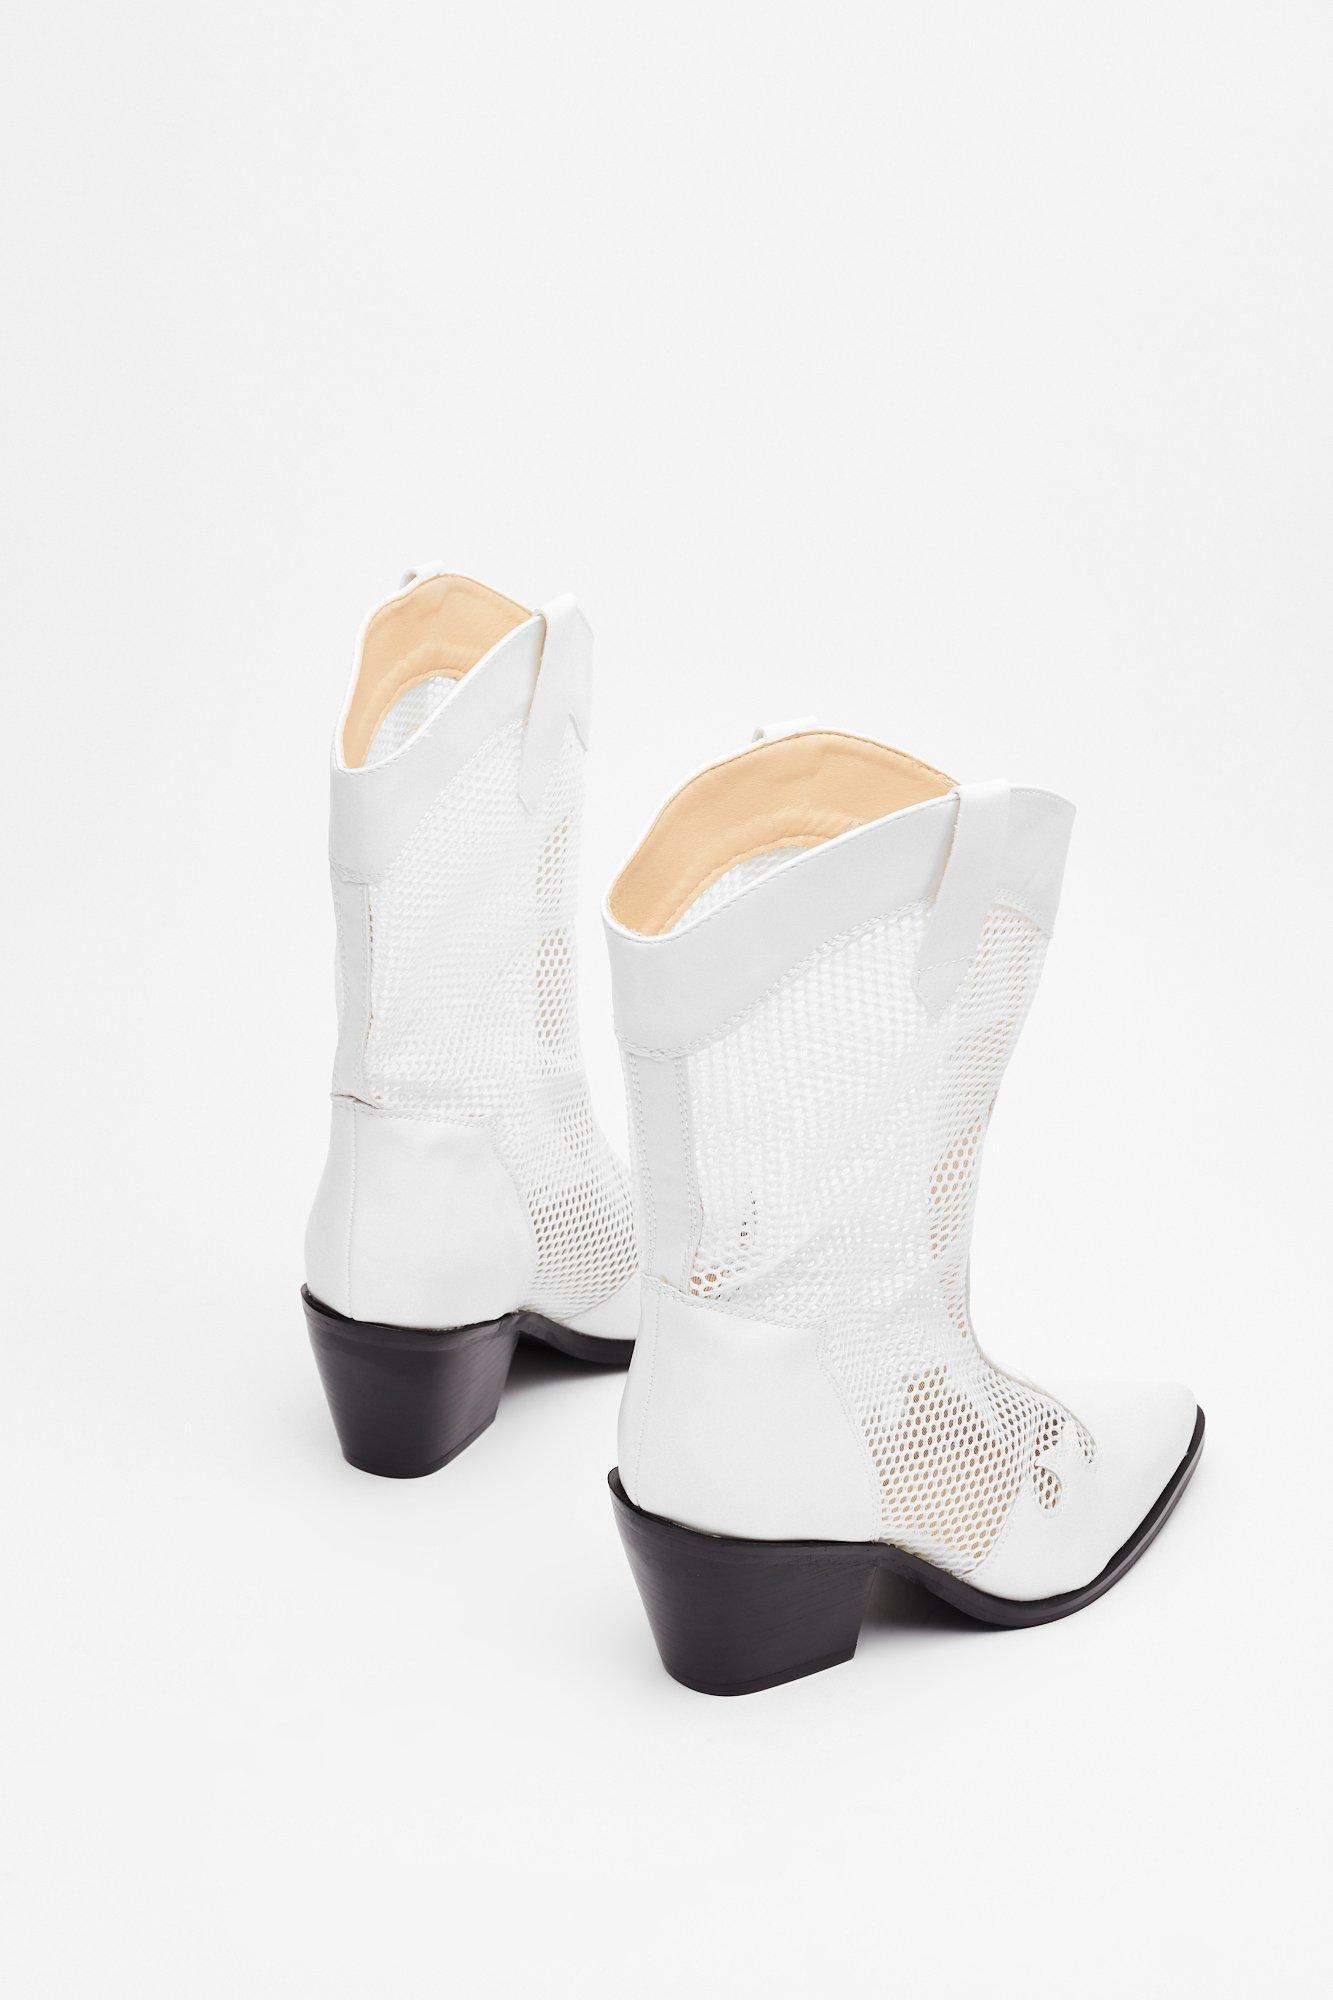 rootin'-tootin' Mesh Cowboy Boots